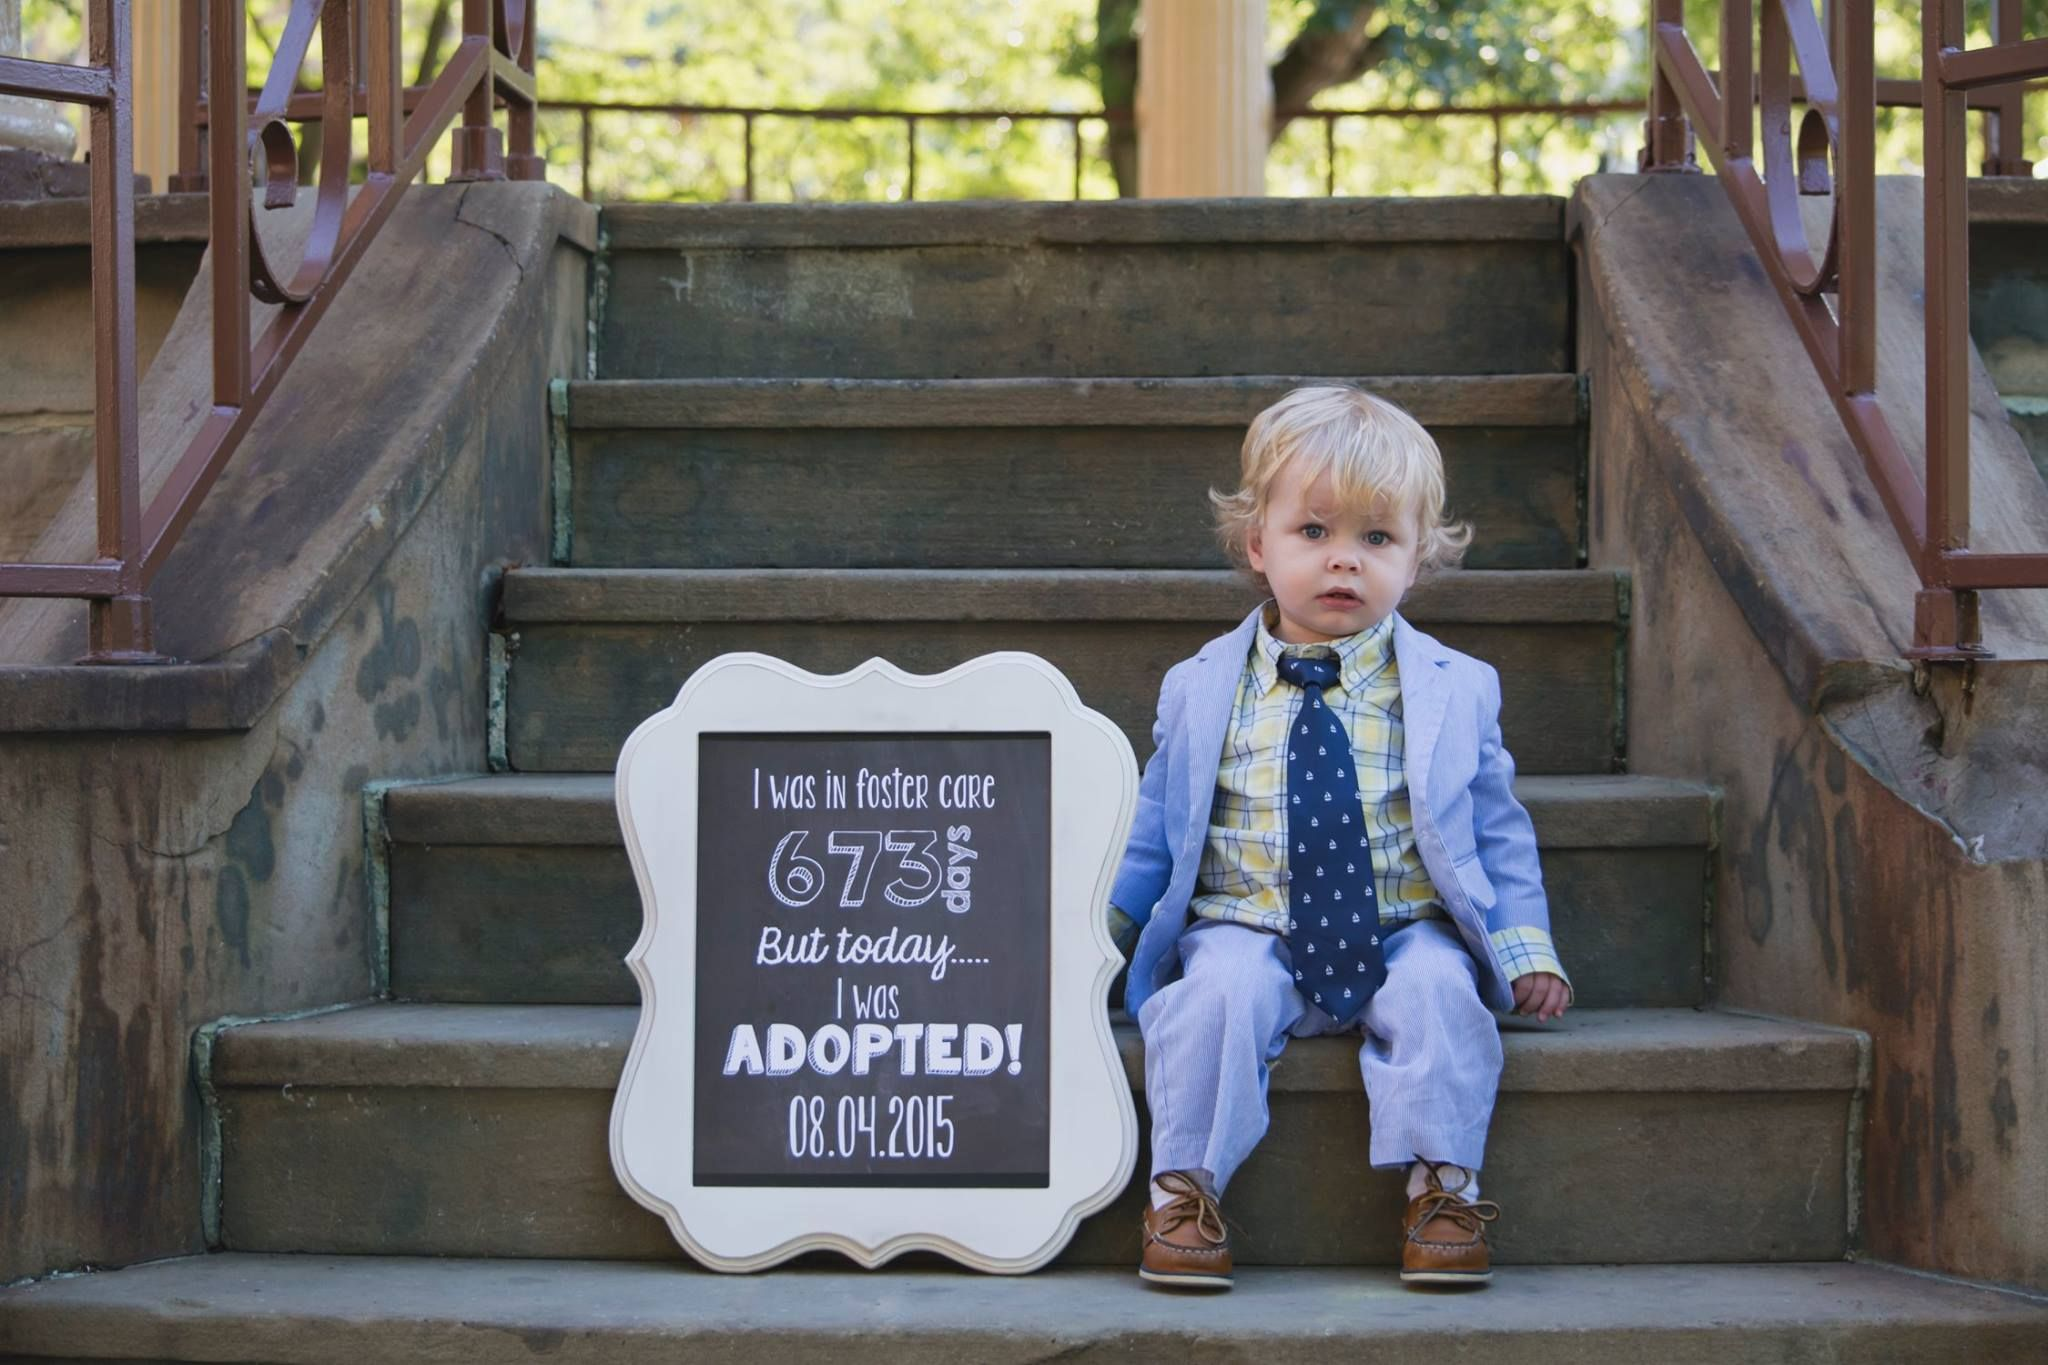 10 Inspiring Adoption Baby Shower Party Ideas Cutestbabyshowers Com Adoption Baby Shower Adoption Photography Adoption Photos